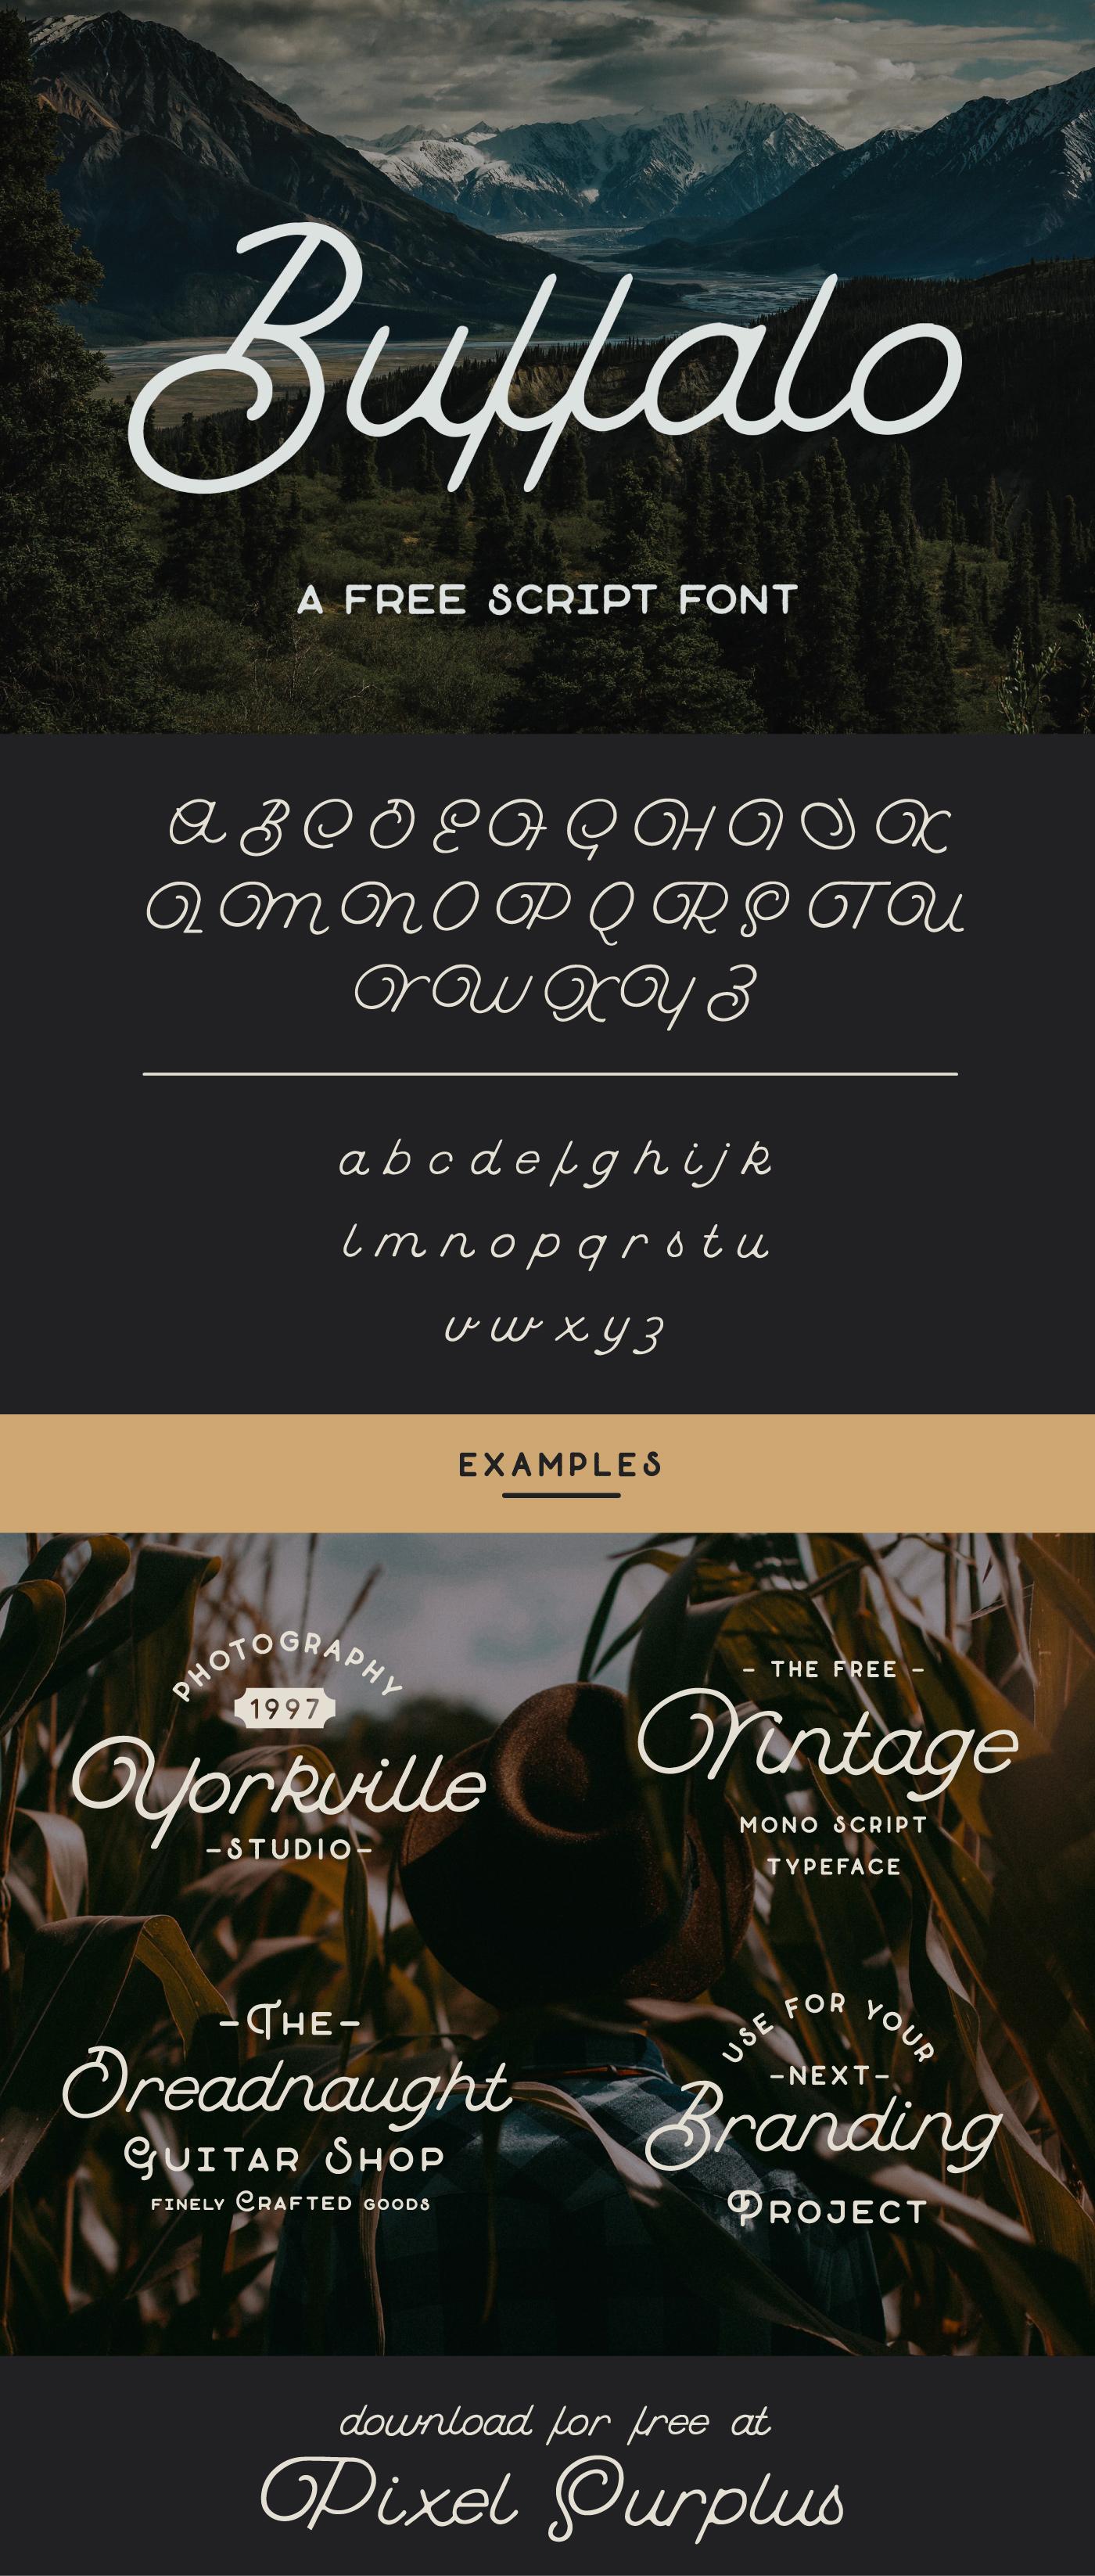 buffalo free script font